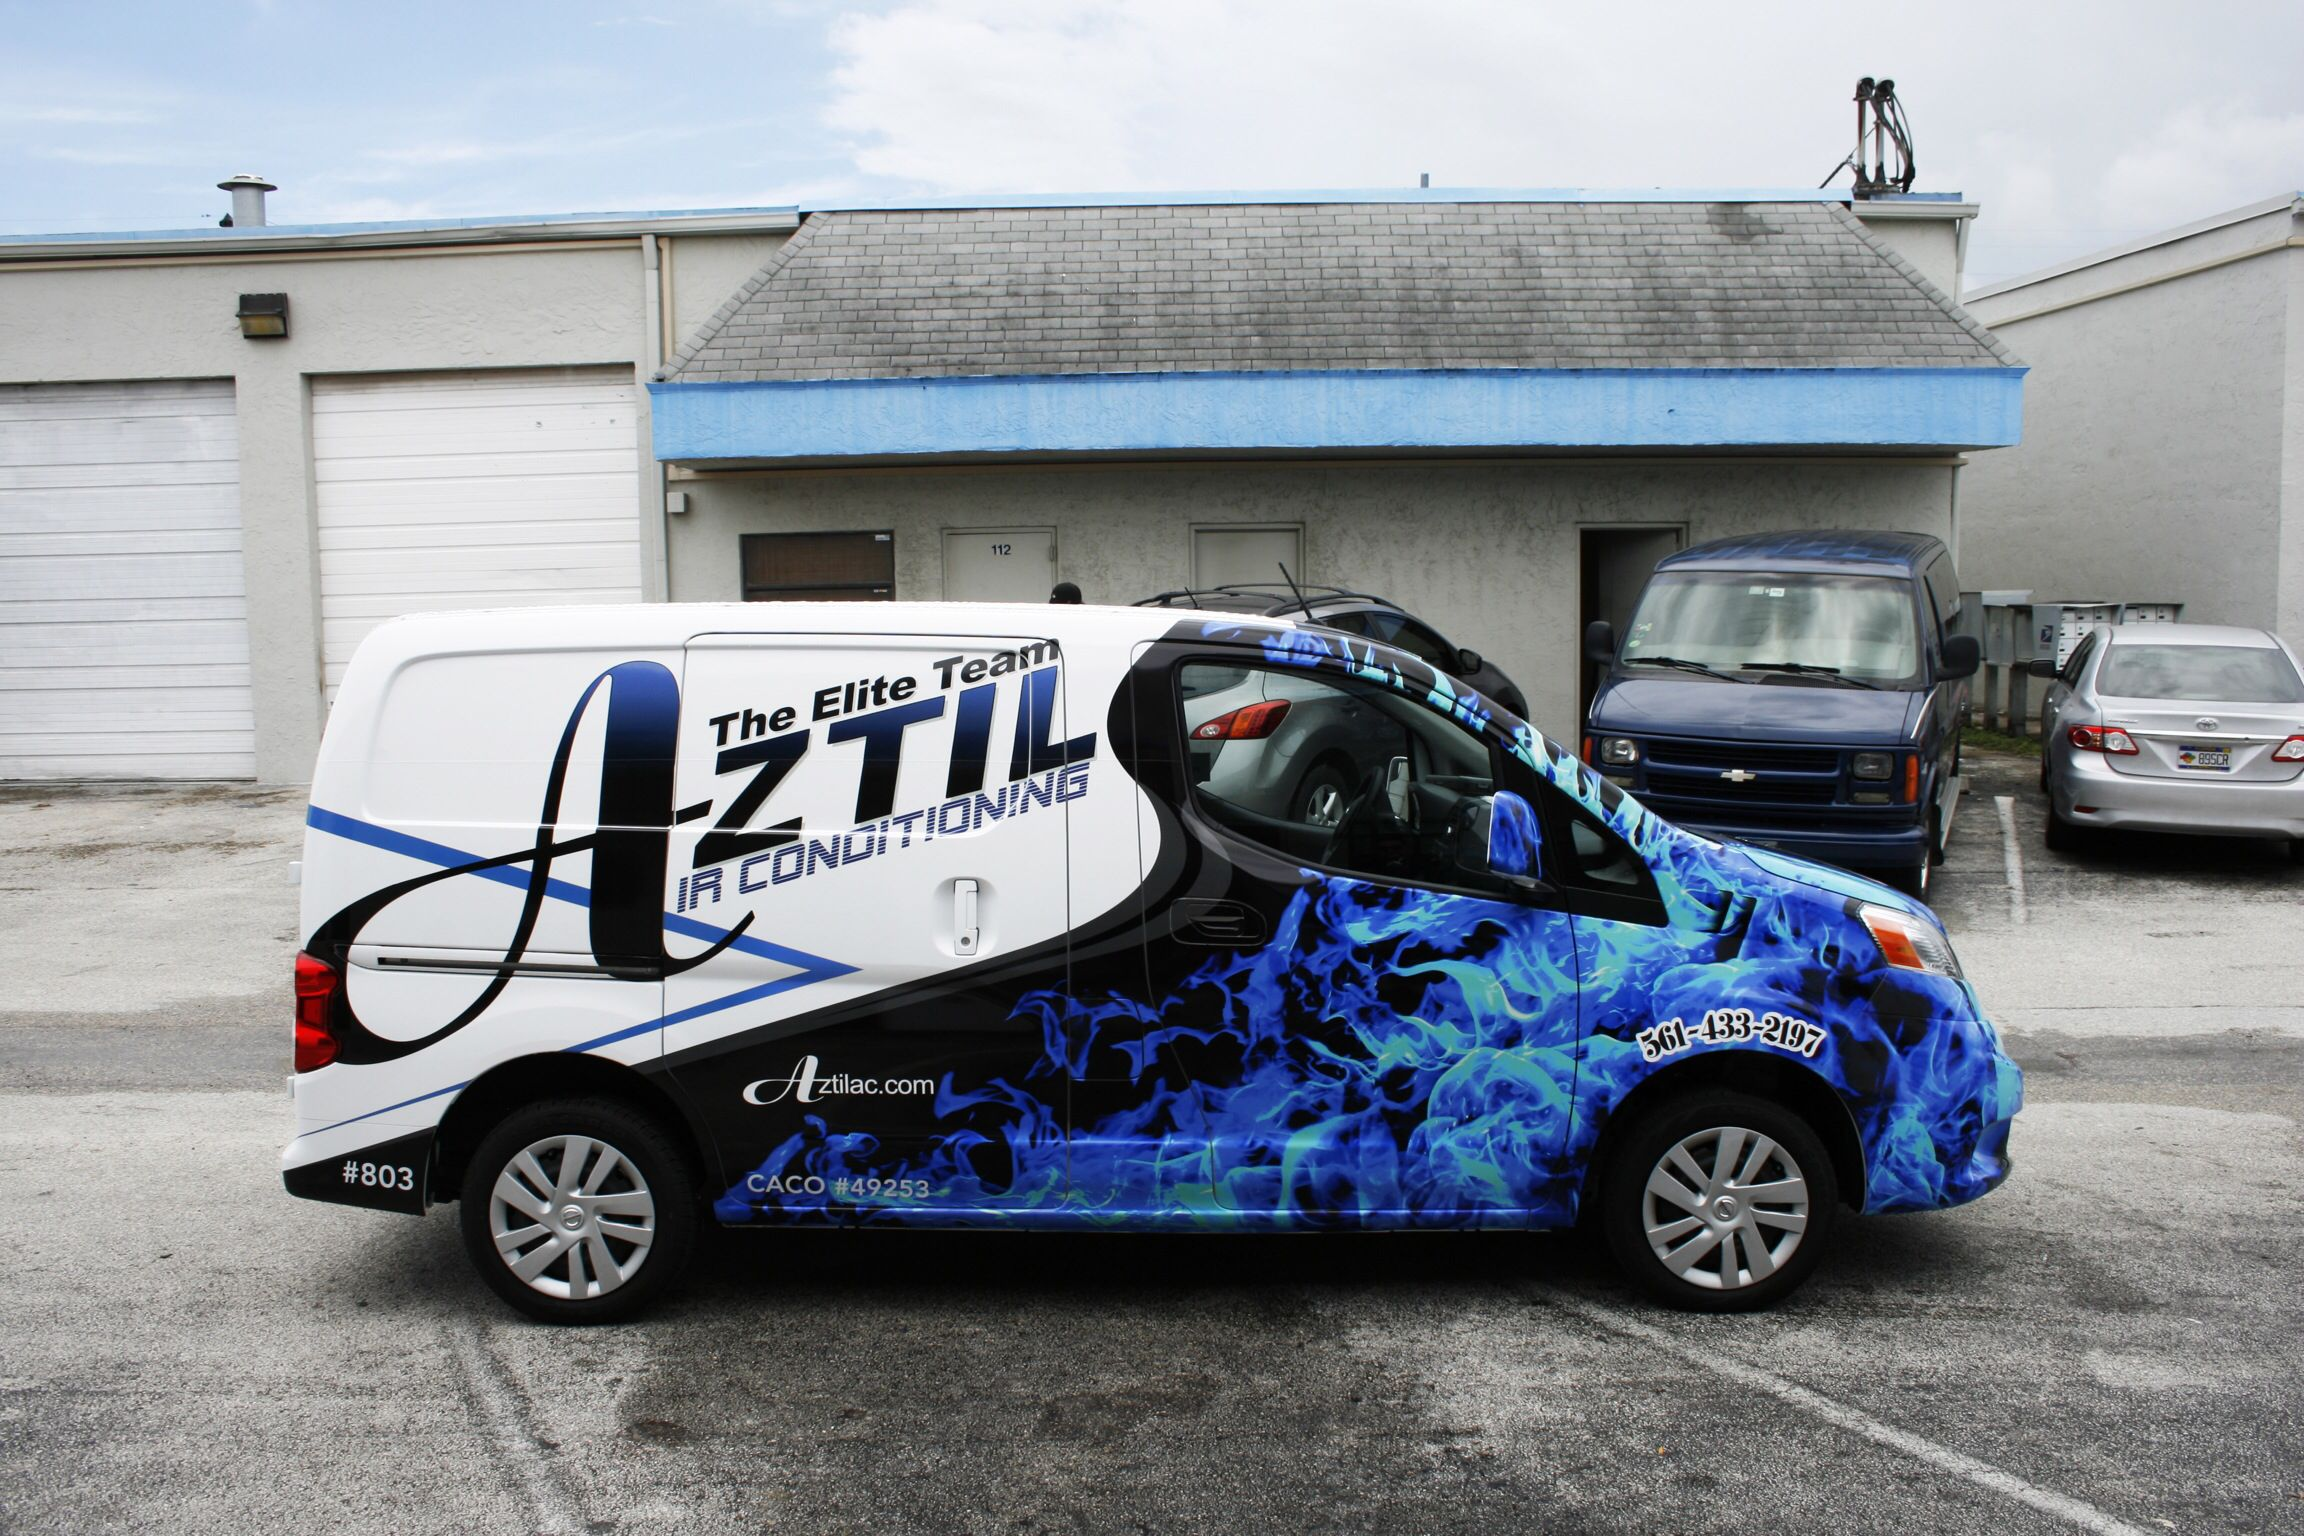 Pin By Emmanuel Trotter On Graphics Car Pinterest Wraps Car - Vinyl bike wrapvinyl bike wraps davie vinyl car wrap custom wraps